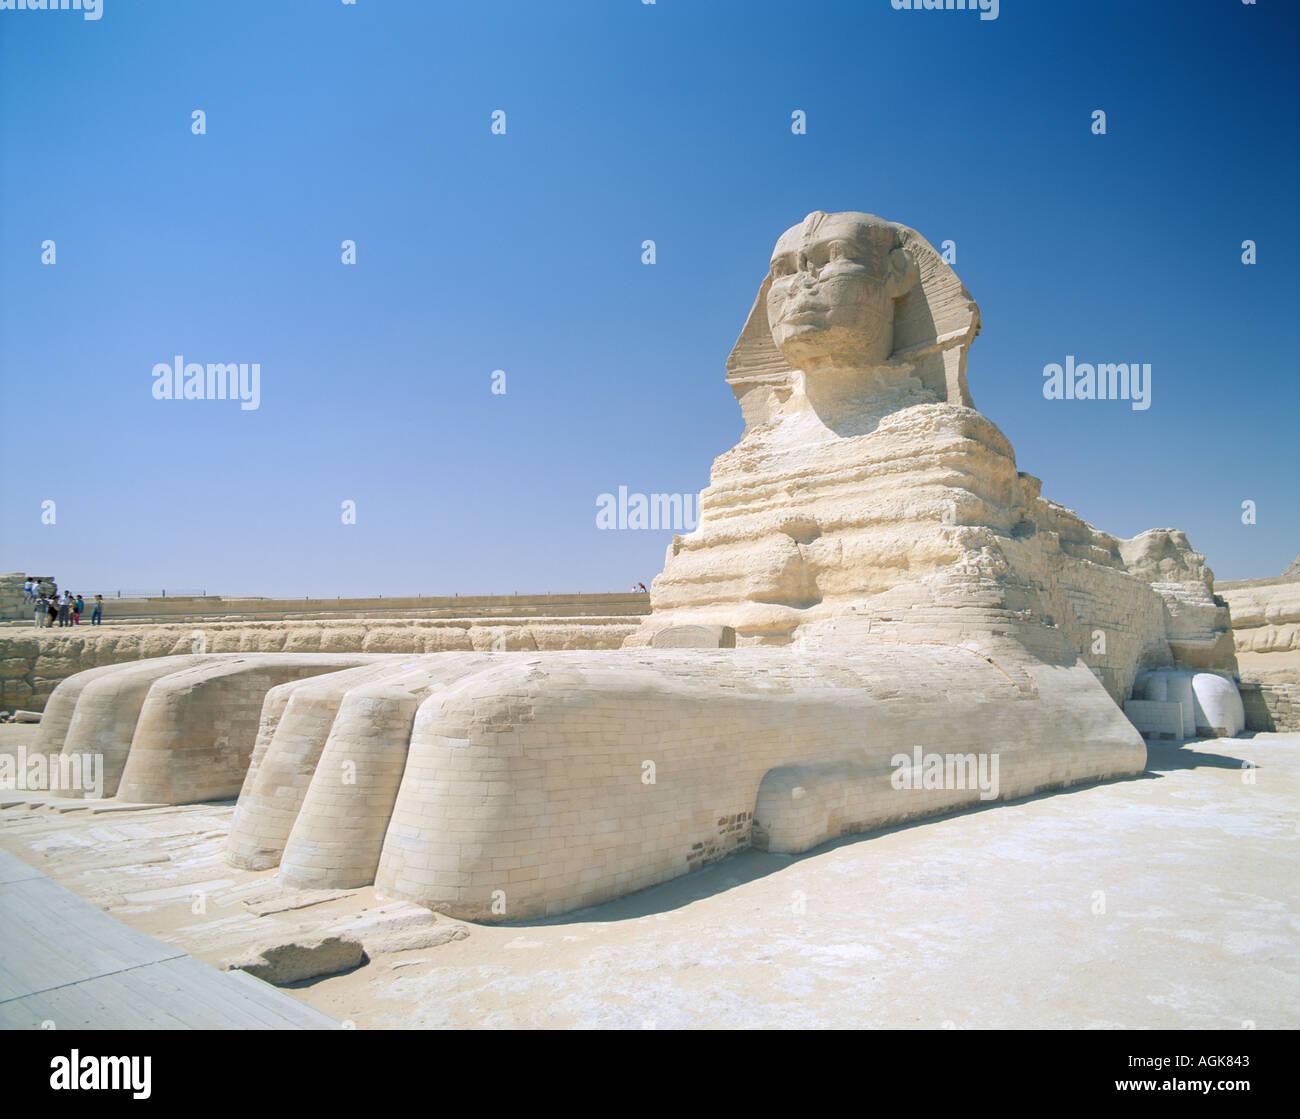 Sphinx Giza Cairo Egypt - Stock Image